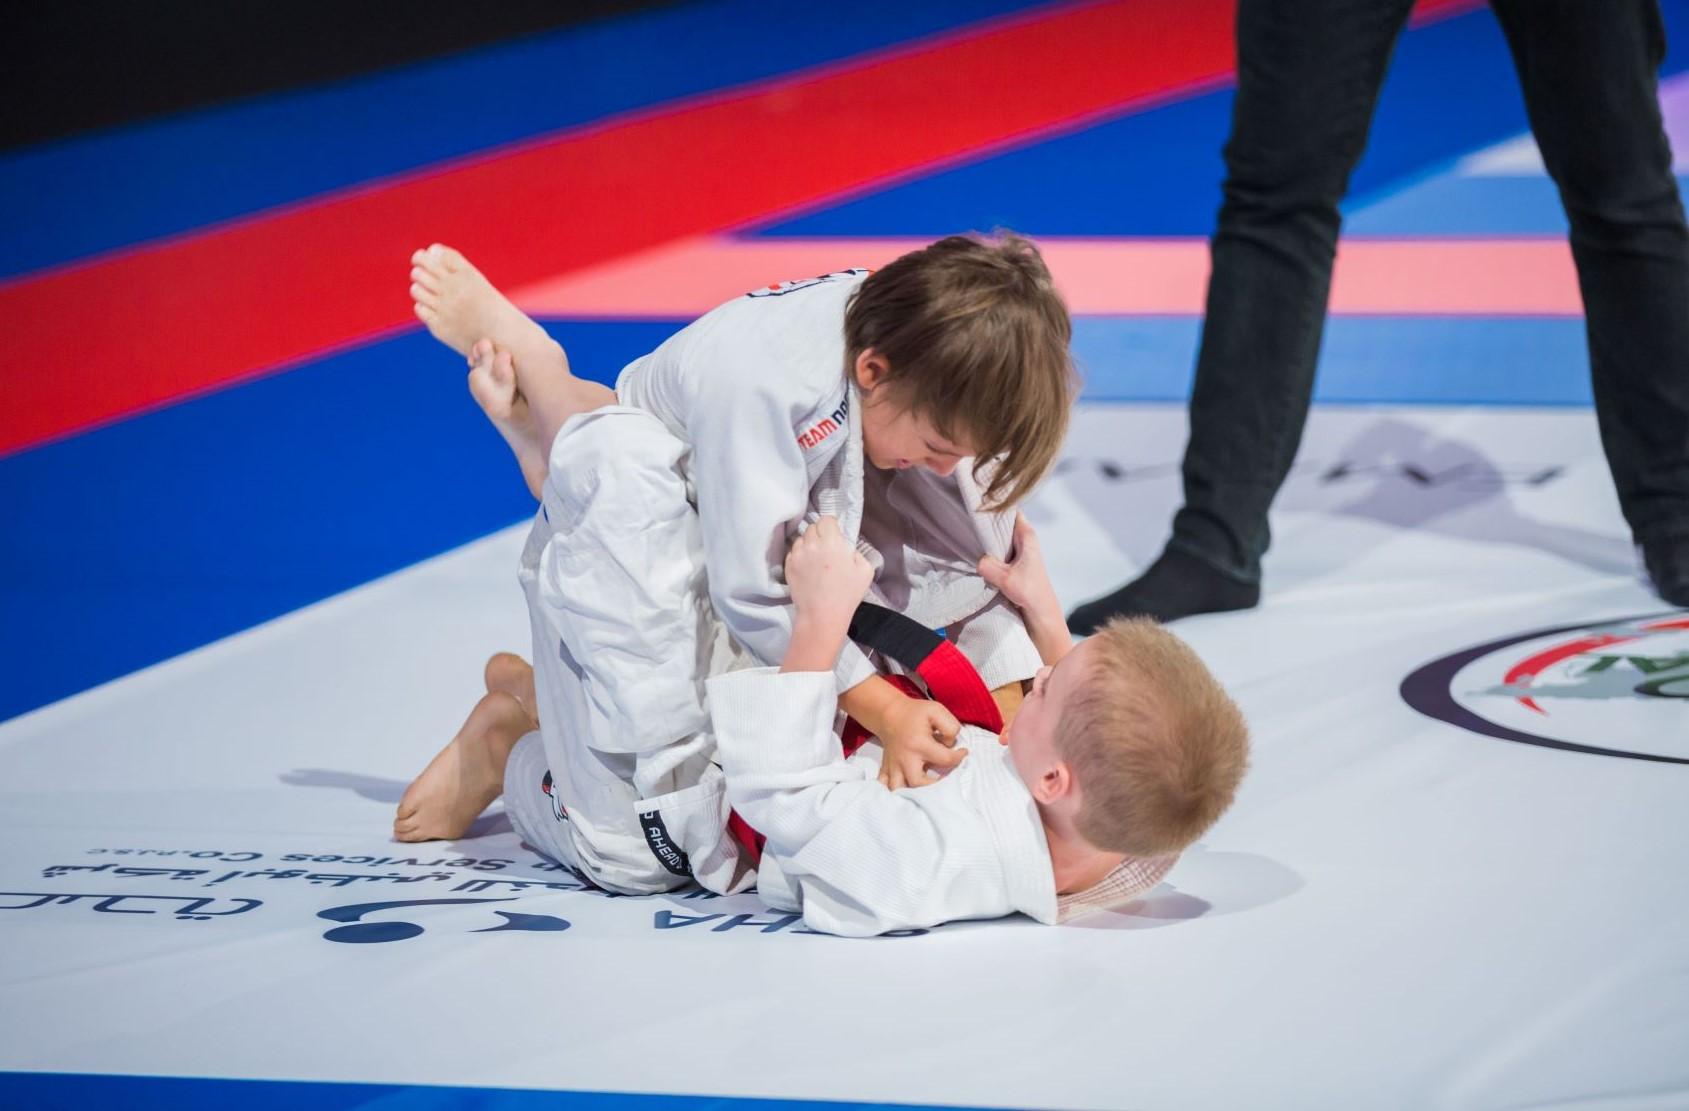 abu dhabi world professional jiu-jitsu championship shows jiu-jitsu is a sport for all 6.jpg